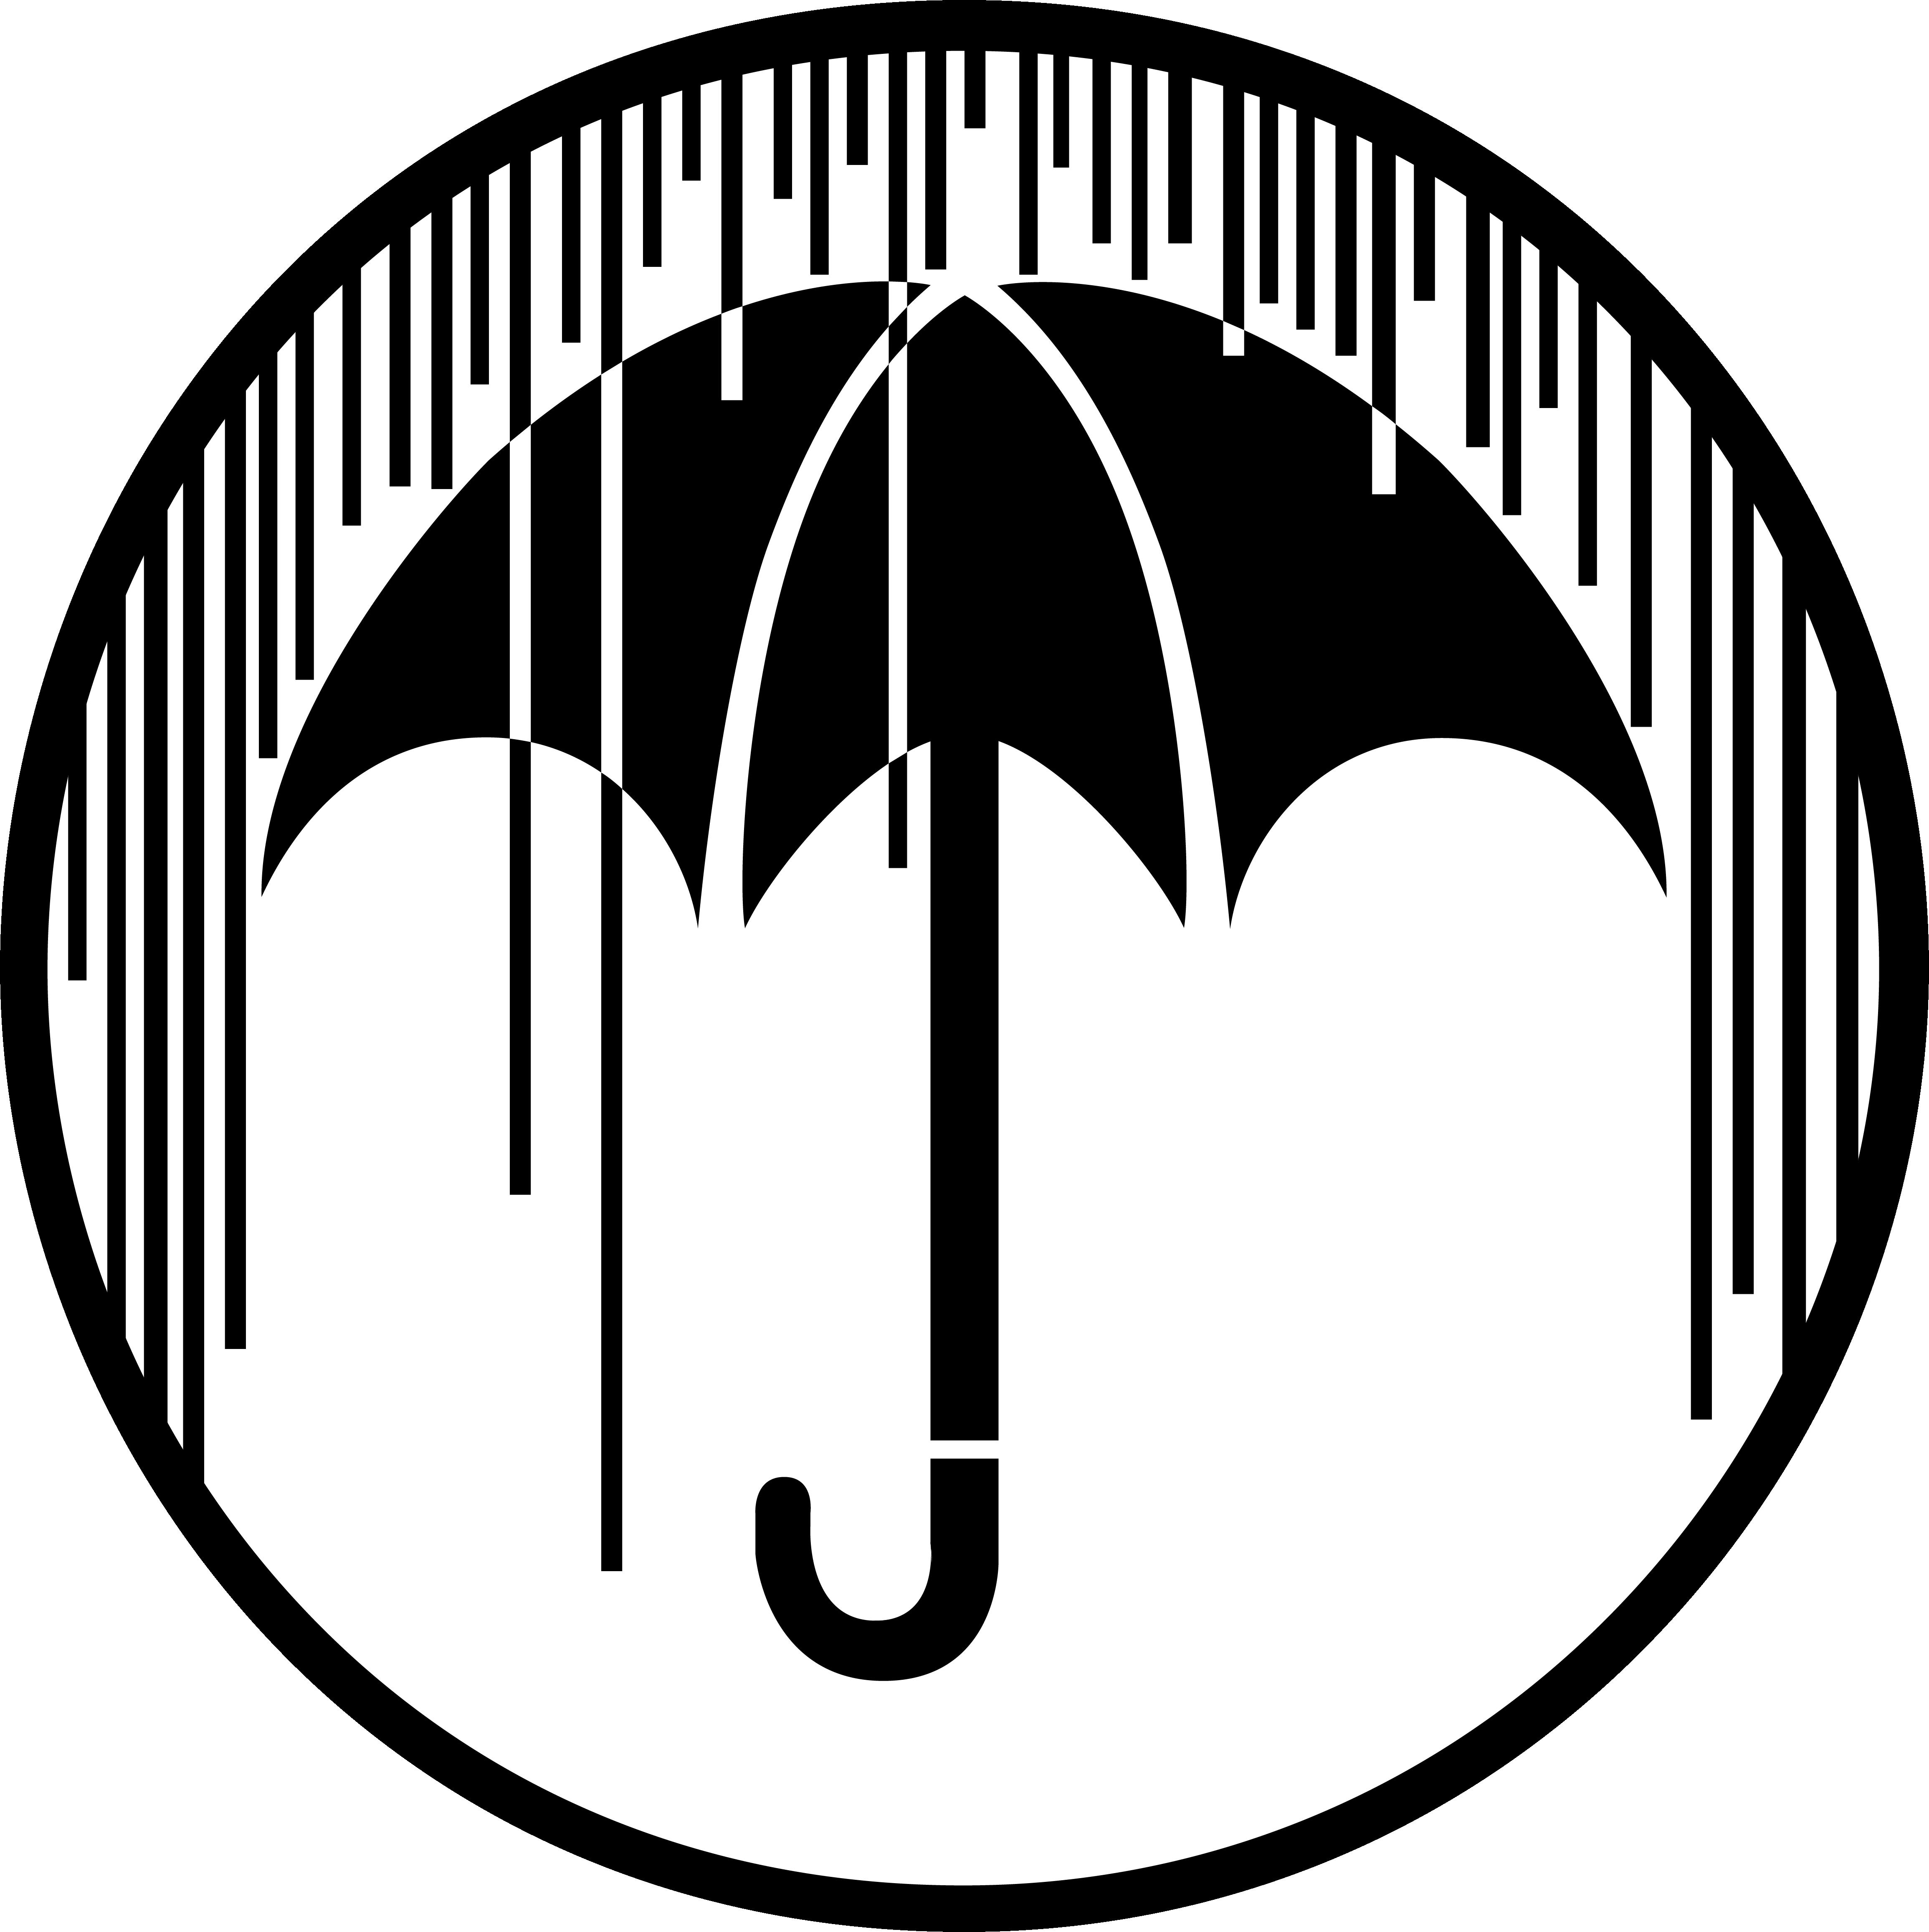 The Umbrella Academy Logo Sticker By Lmesmcc In 2021 Academy Logo Logo Sticker Umbrella